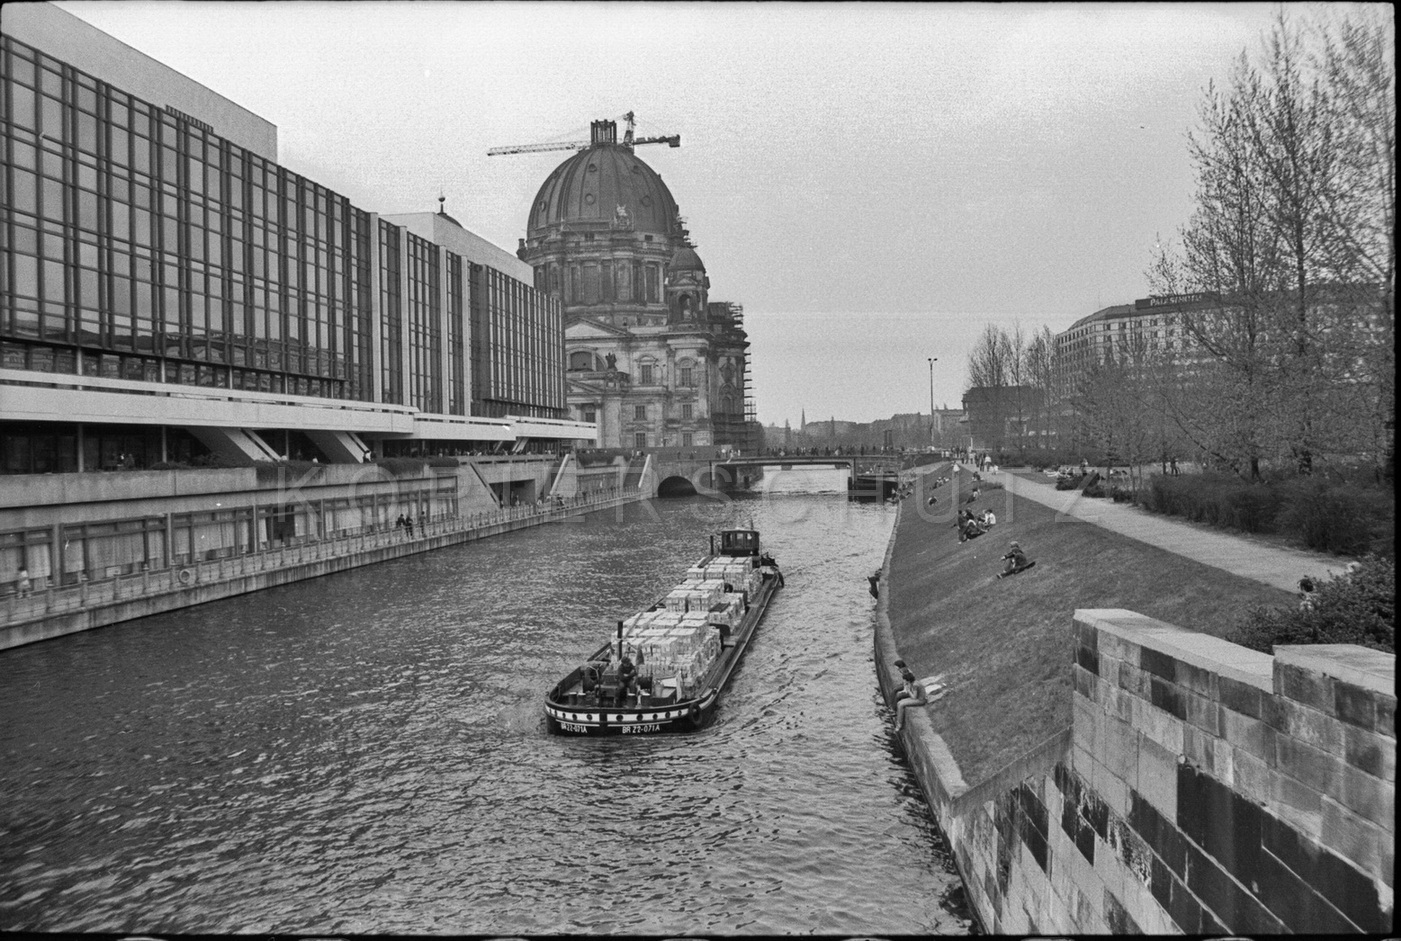 Nr01-082_Palast-der-Republik-161-1980